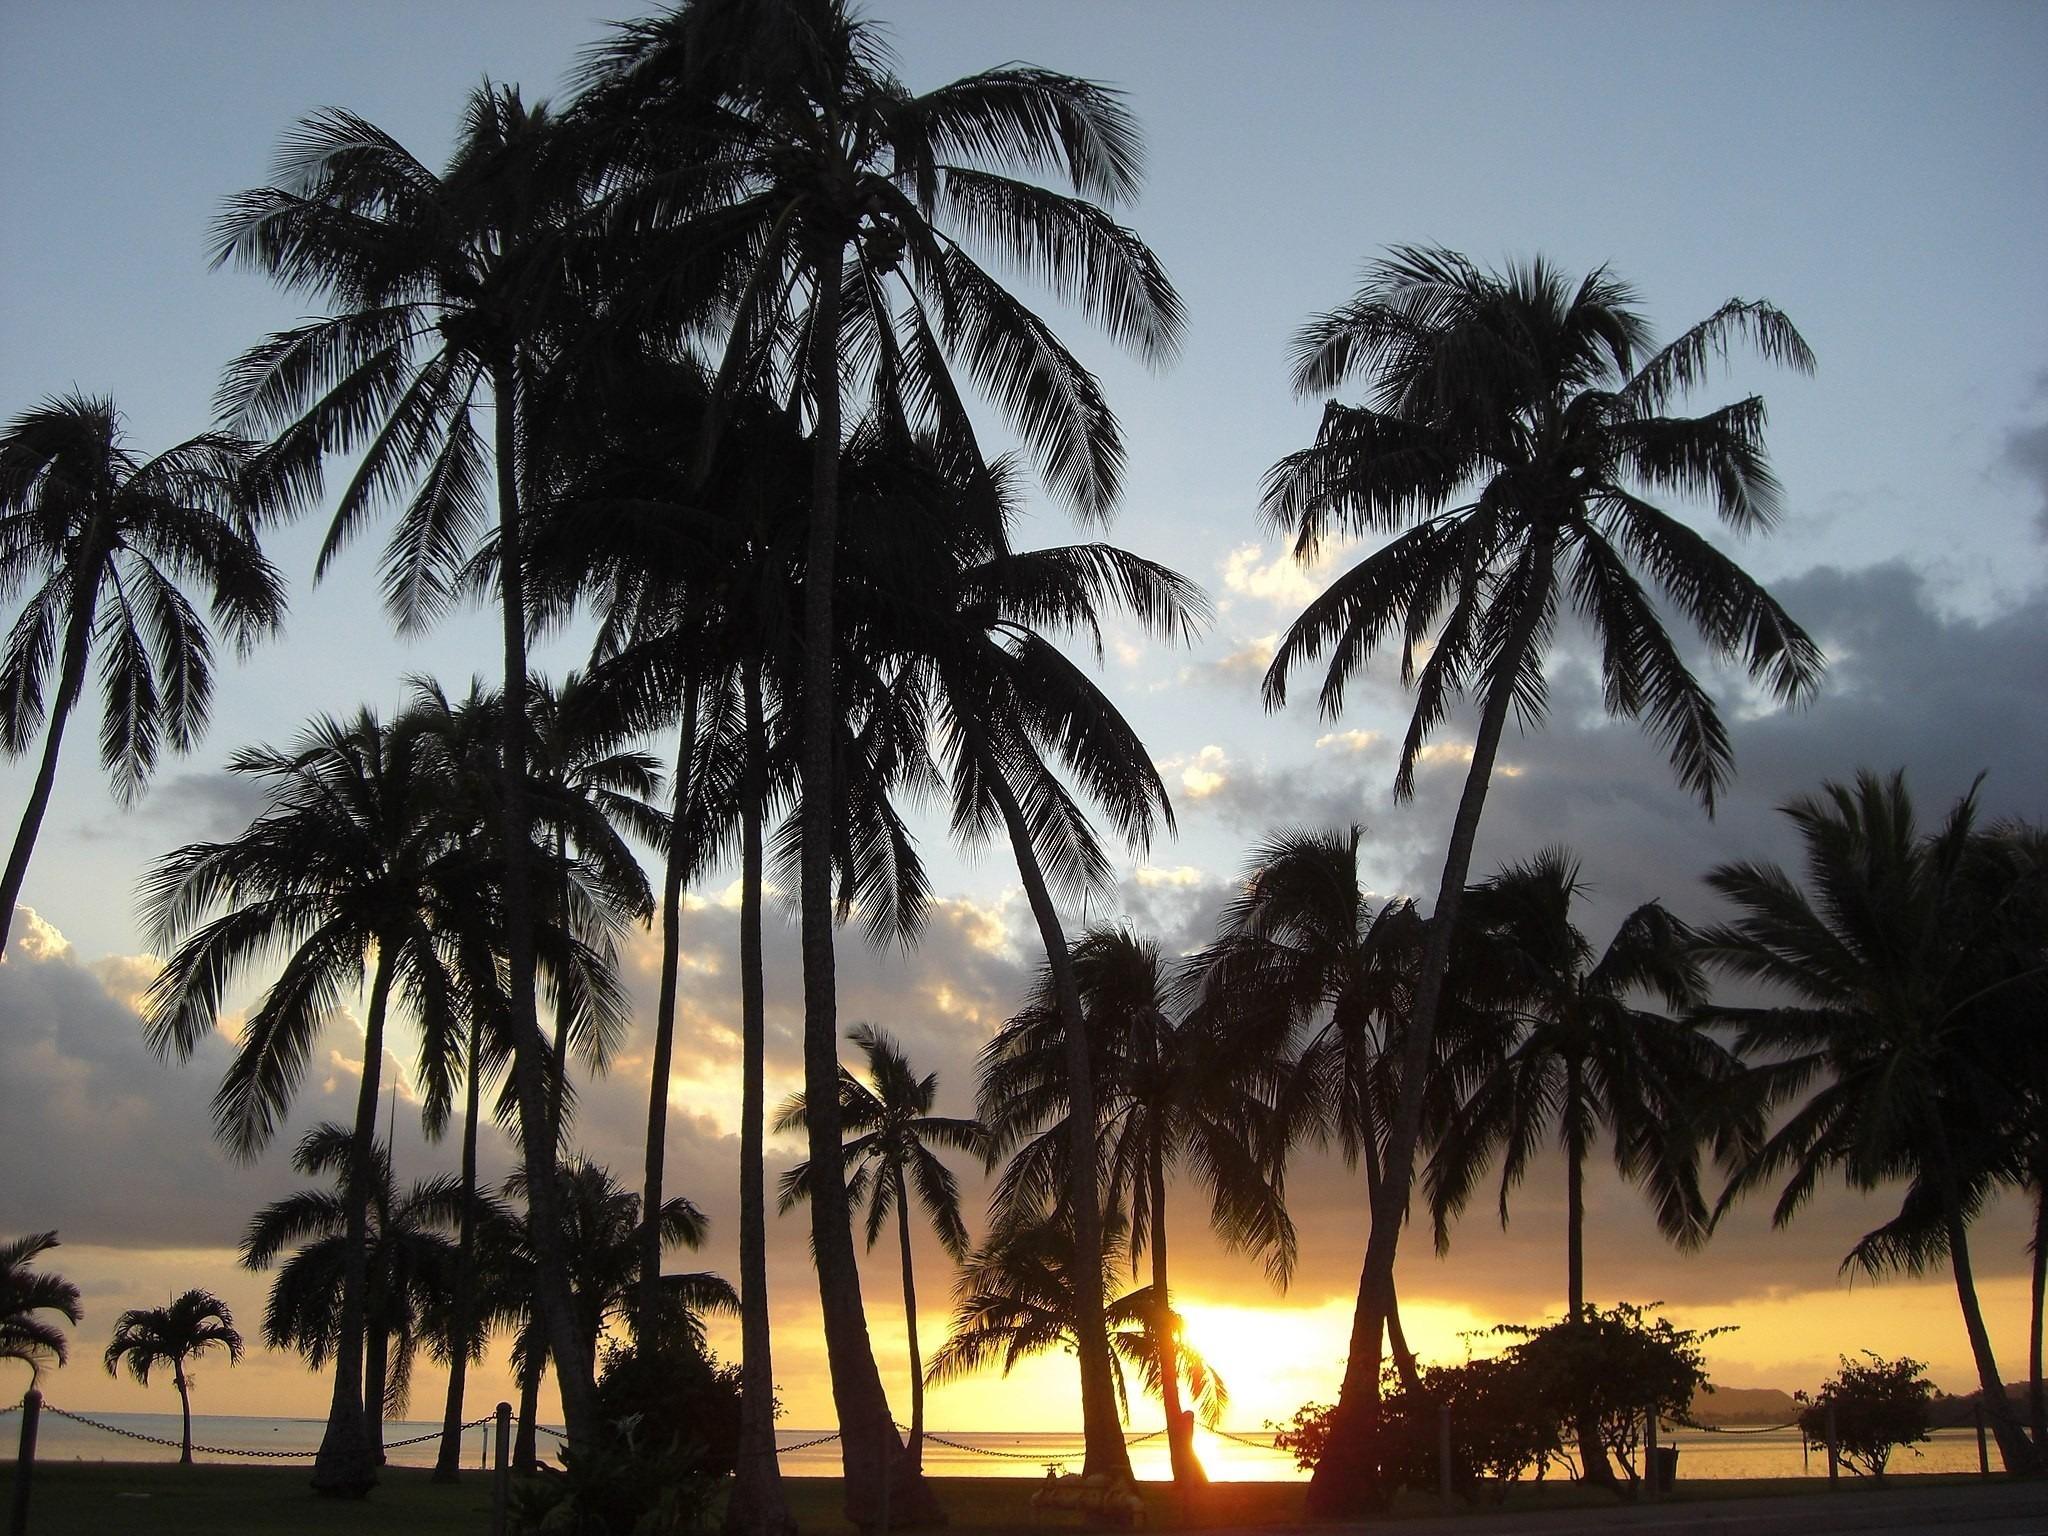 Un coucher de soleil à Hawaï